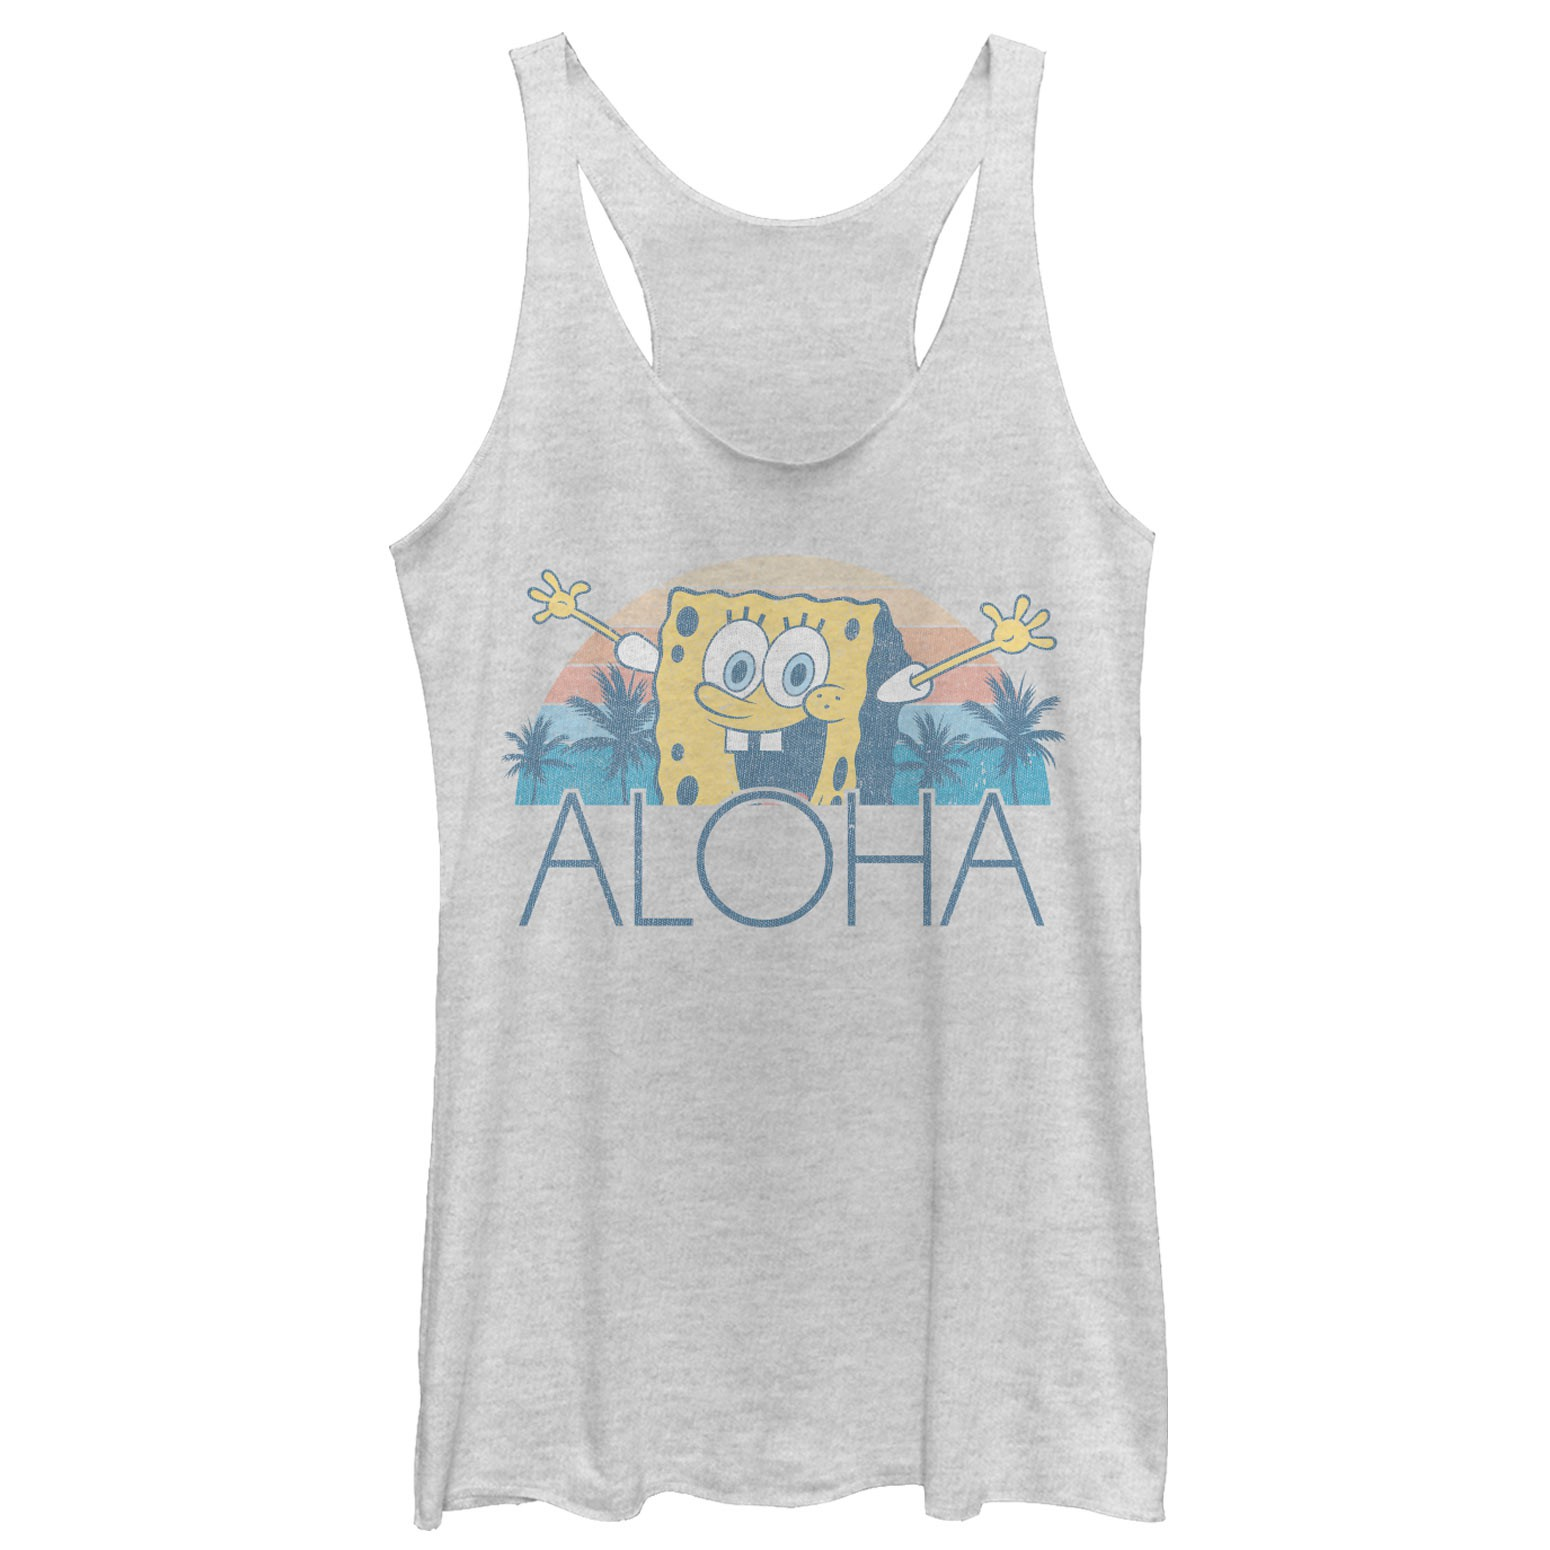 SpongeBob Squarepants Aloha Ladies Grey Racerback Tank Top